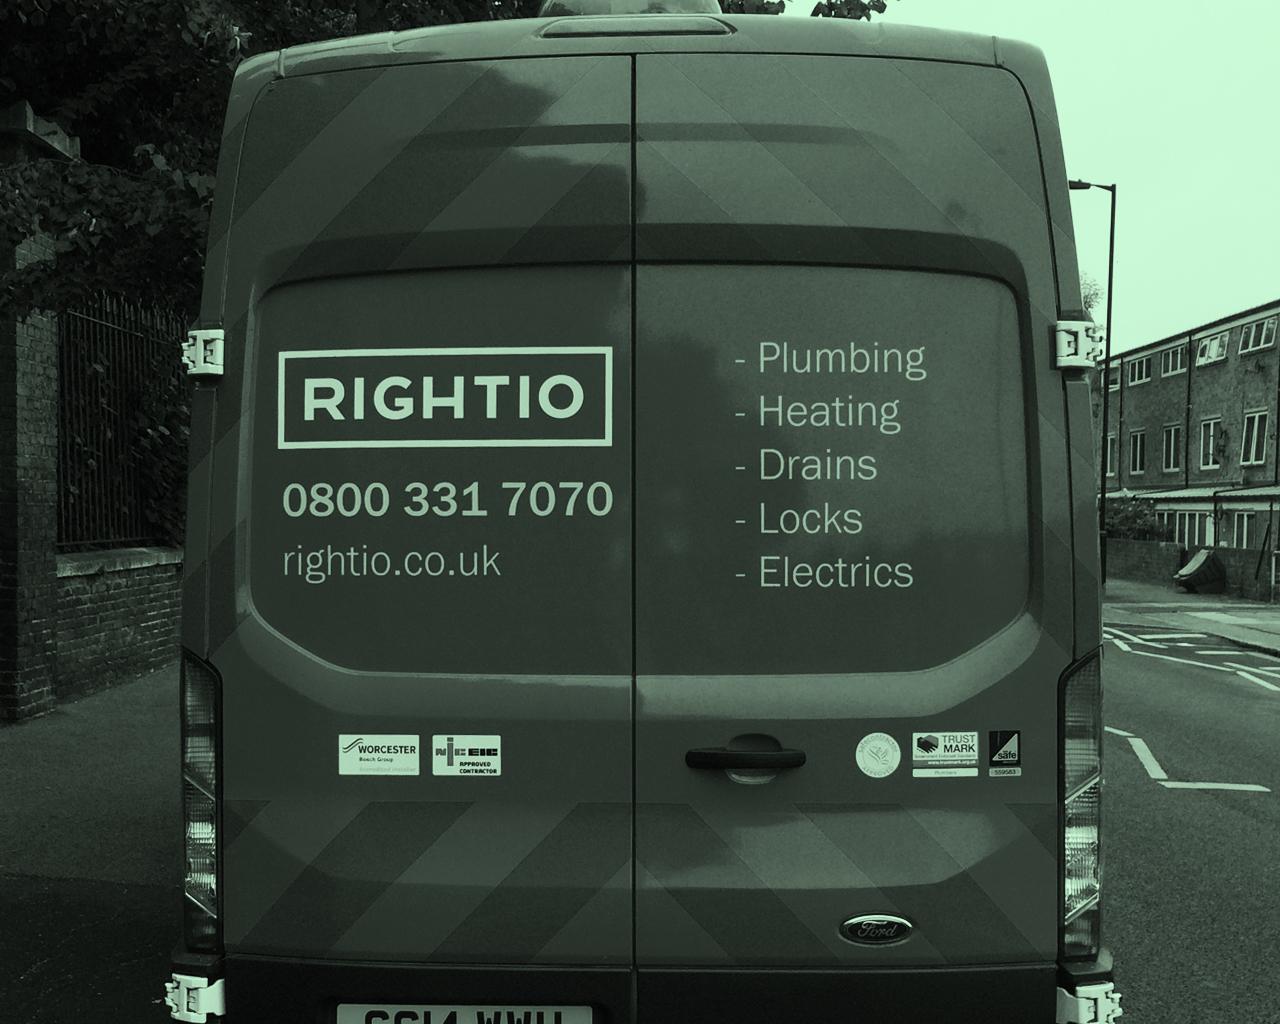 A van that thinks it's an app